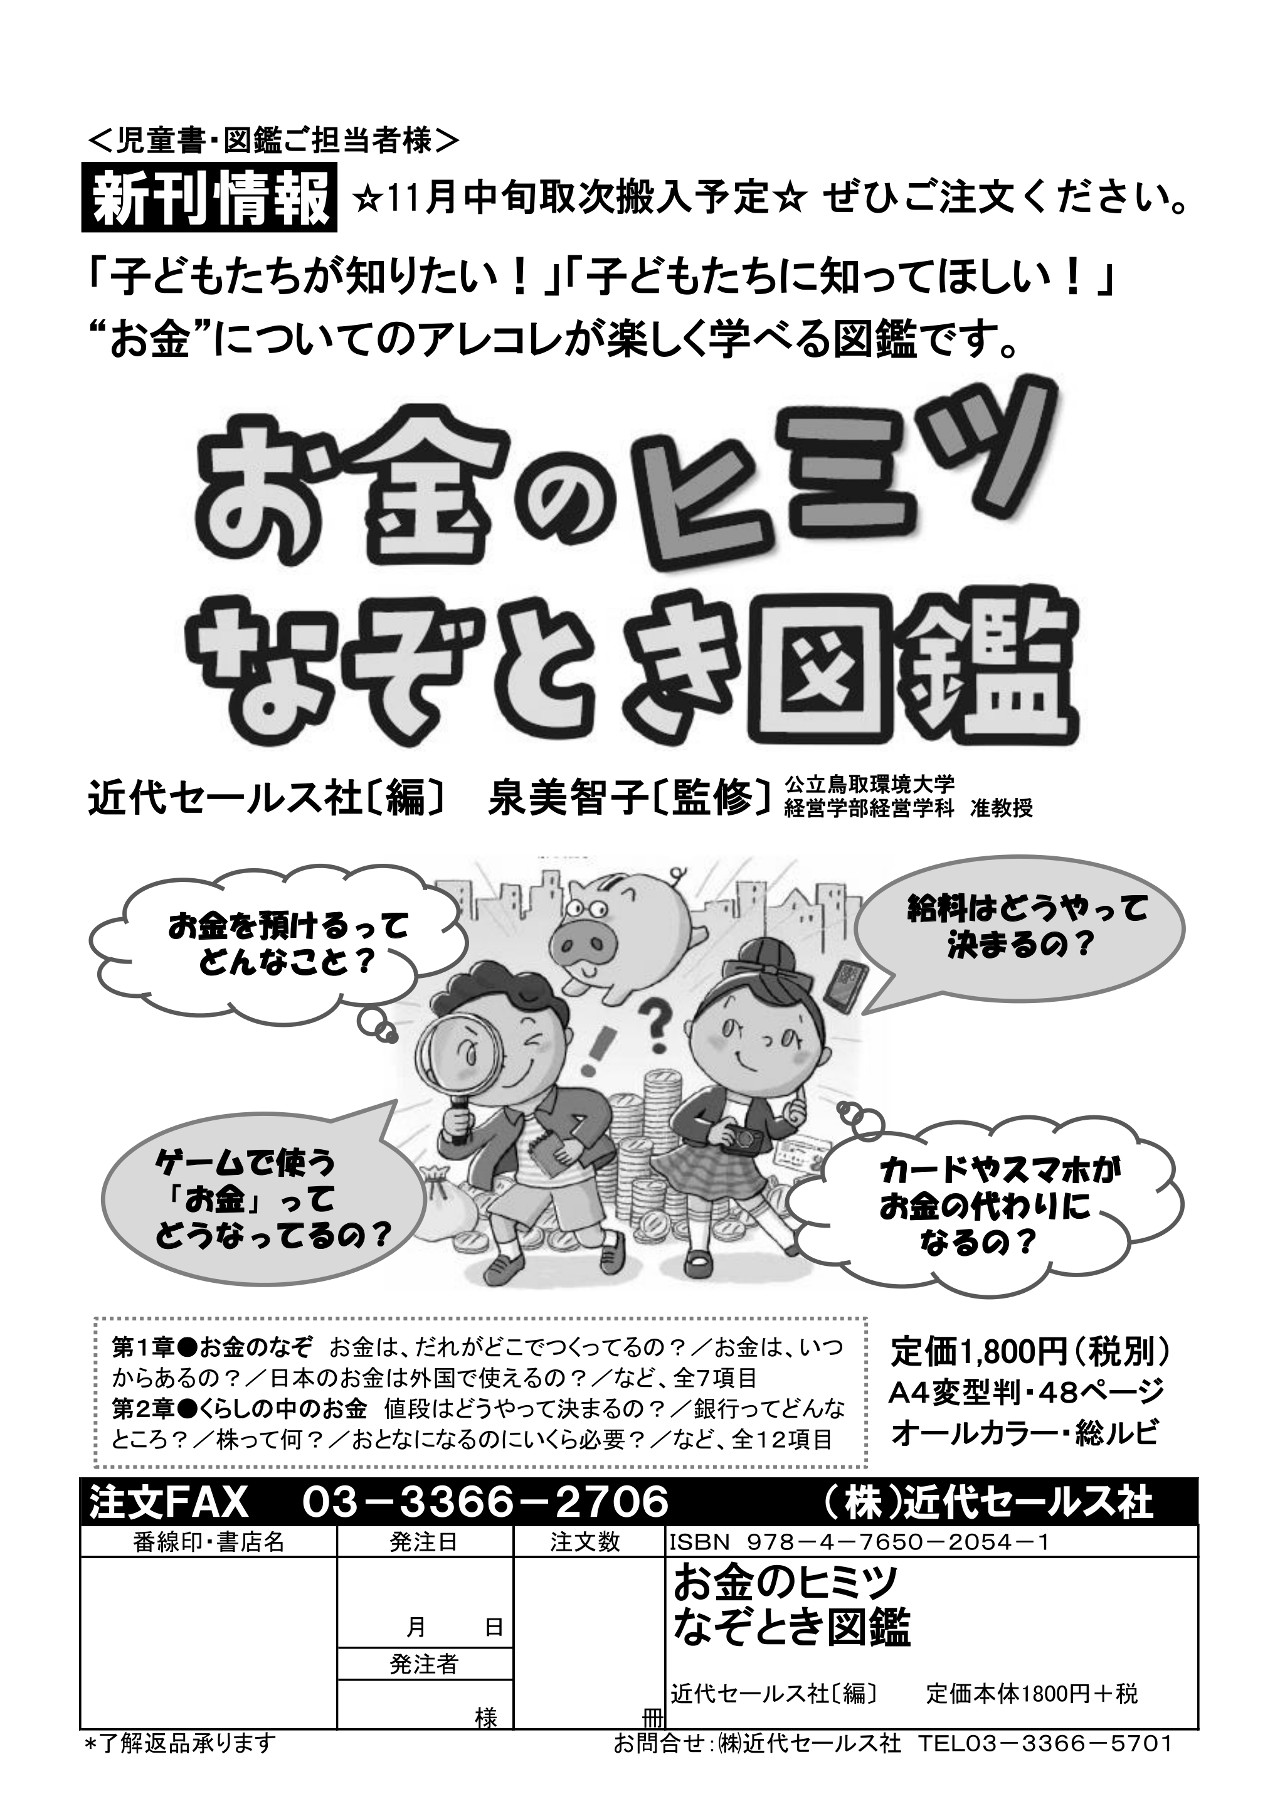 kindai-sales_1610200944_1